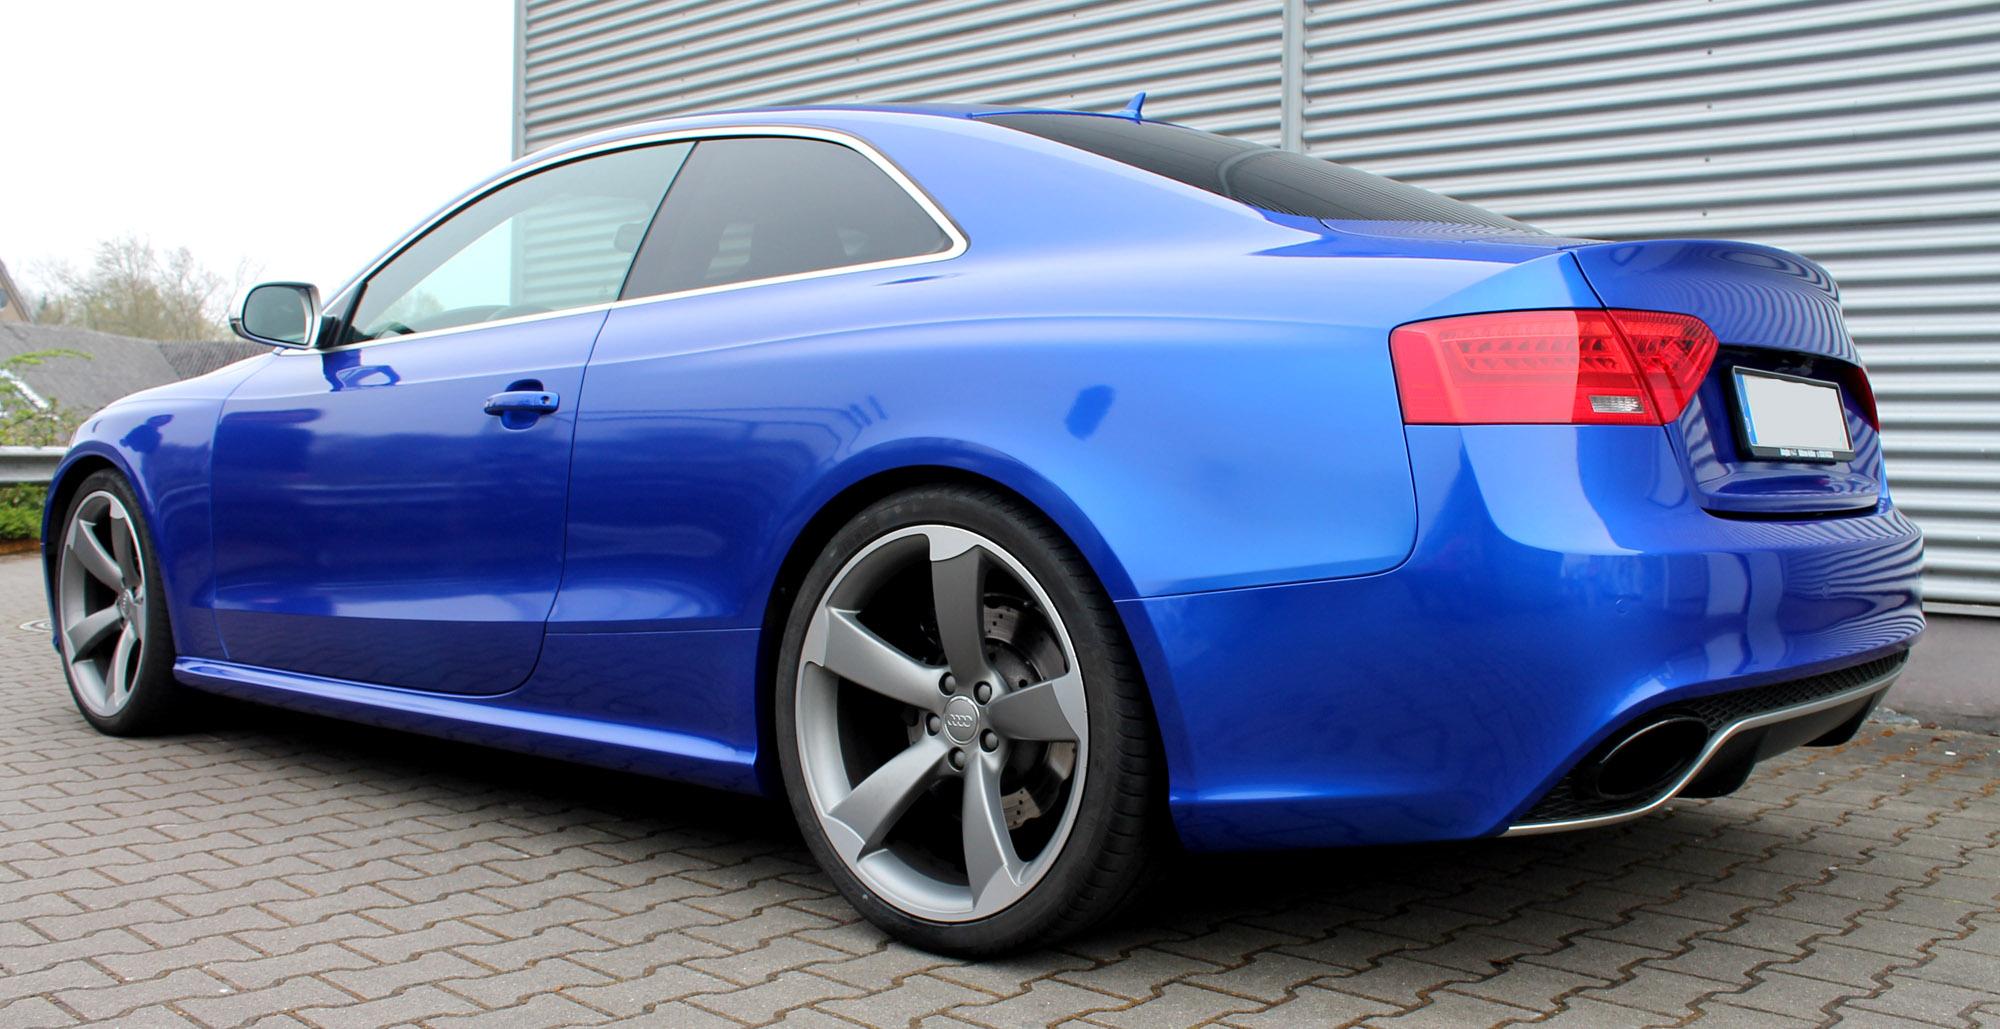 Carwrapping Vollfolierung Mit 3m Gloss Cosmic Blue Auf